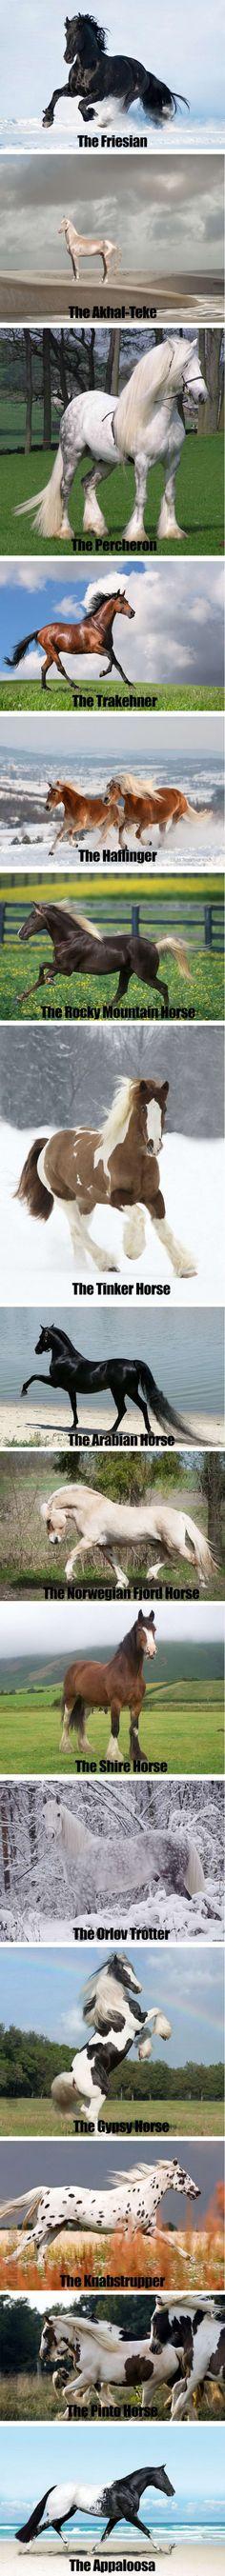 Breathtakingly Beautiful Horses